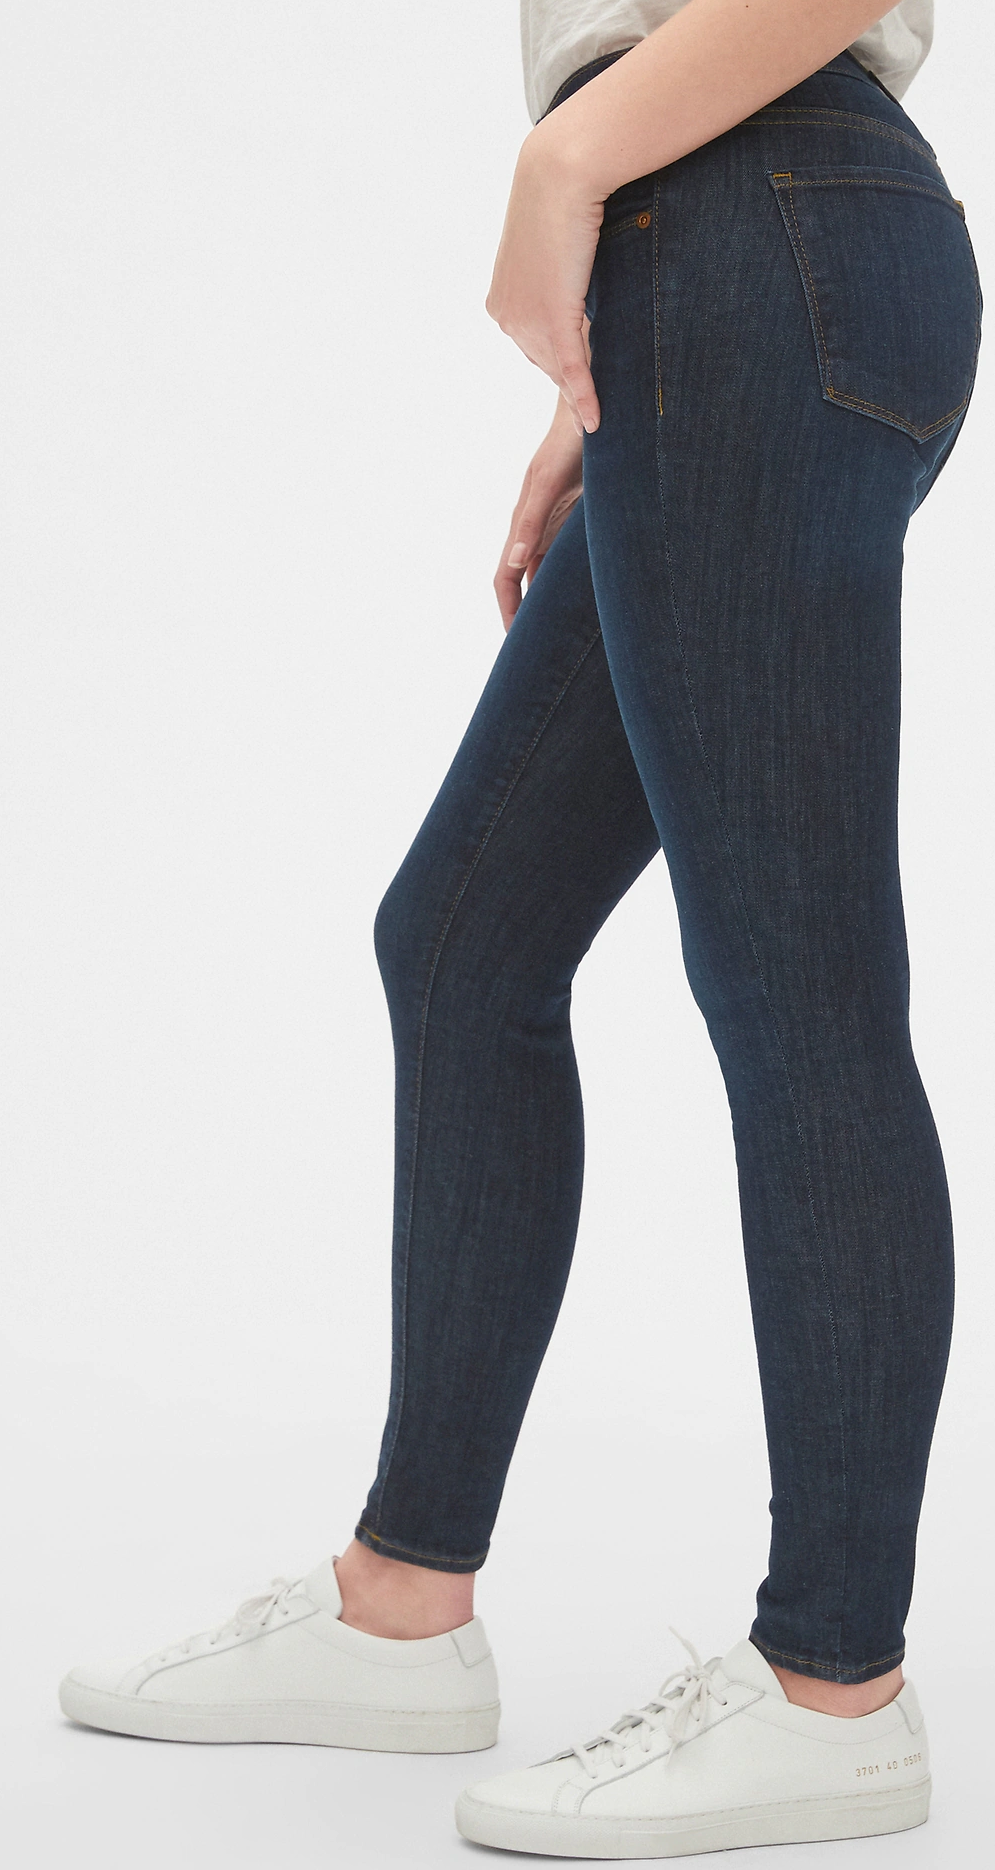 Petite Mid Rise Skinny Jeans - Inseam 26